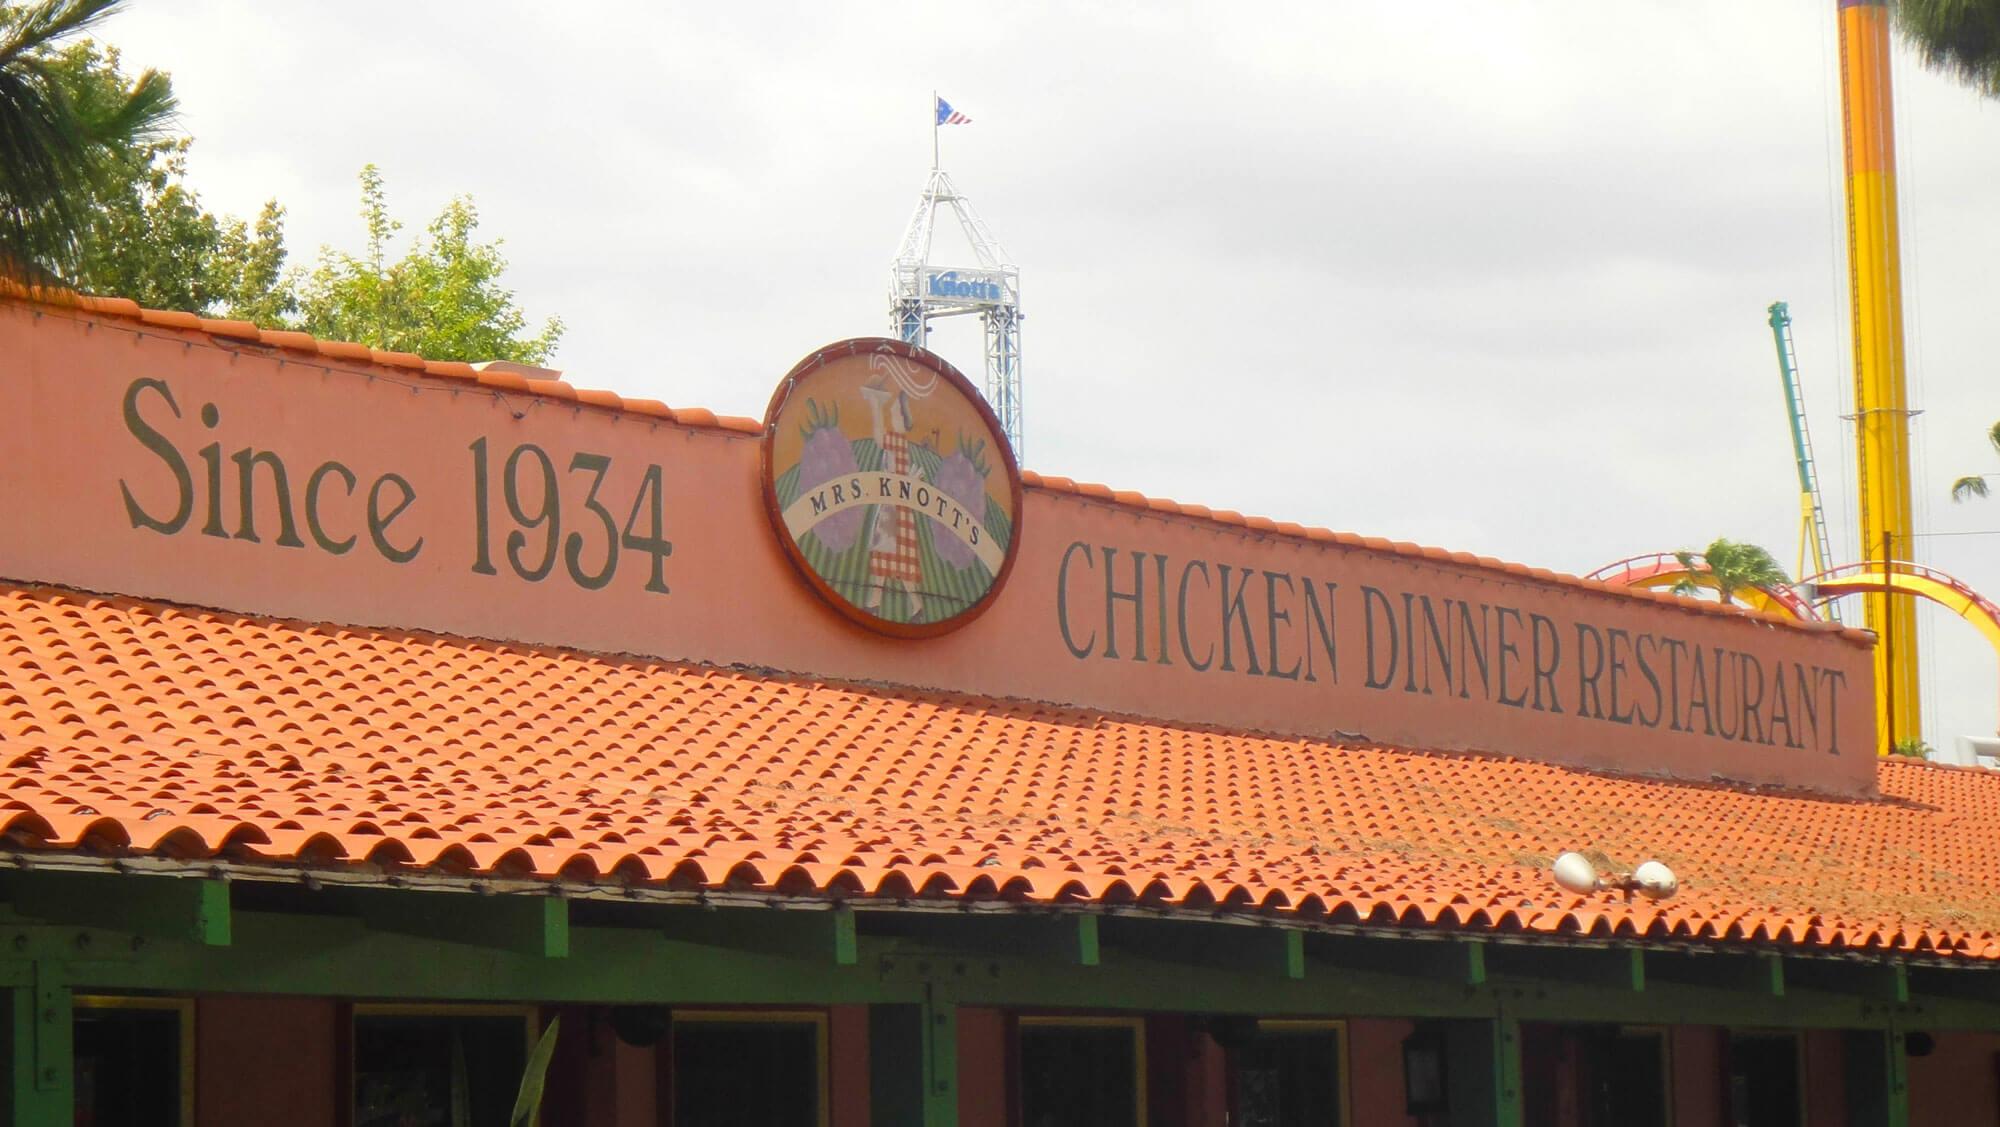 Not to miss Knott's Berry Farm  - Mrs. Knott's Chicken Dinner Restaurant